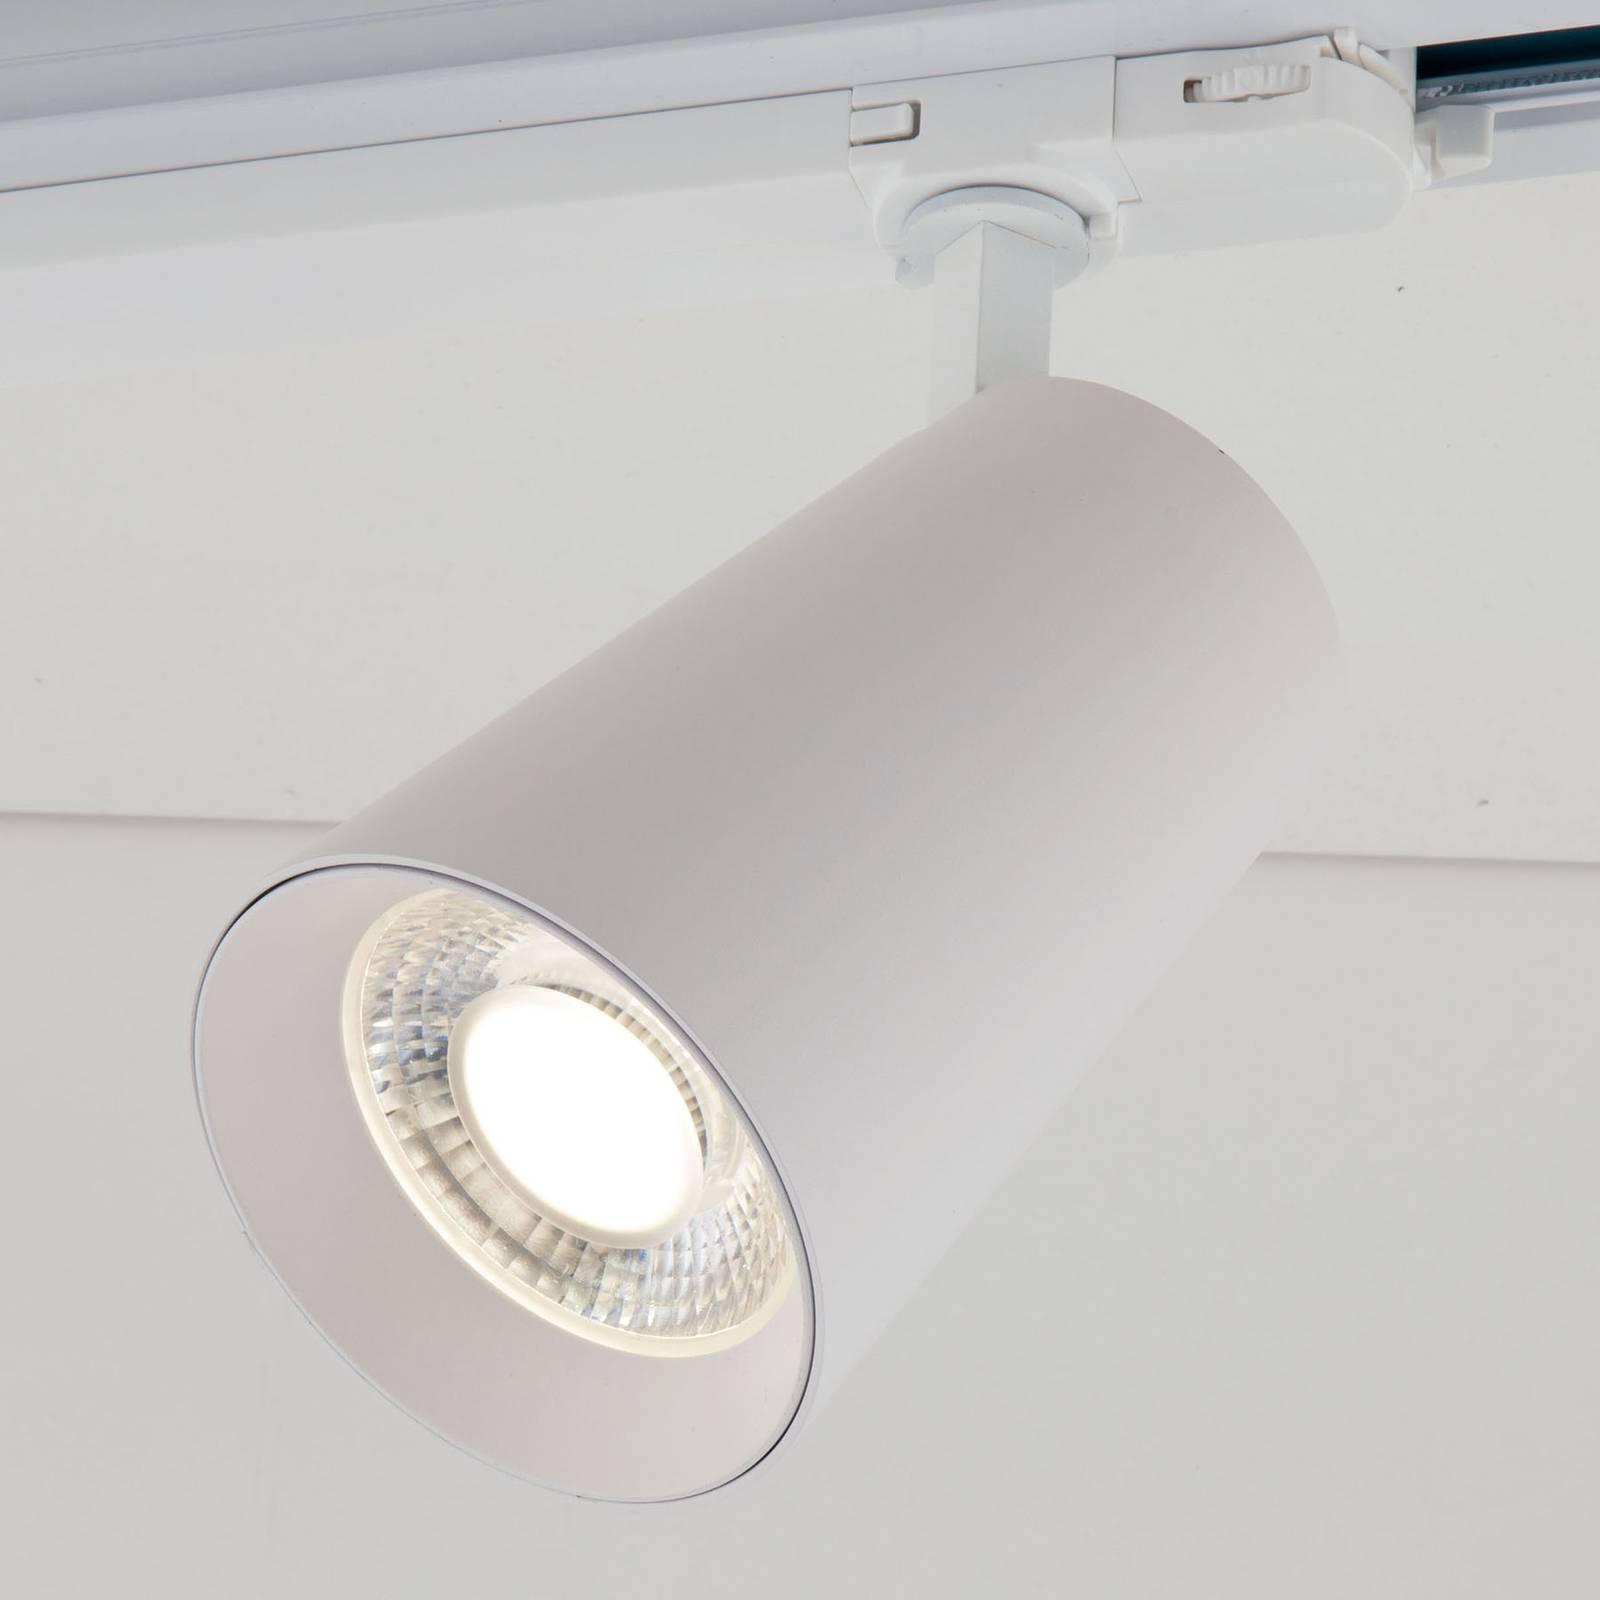 Faretto LED binario Kone 3.000K 13W bianco